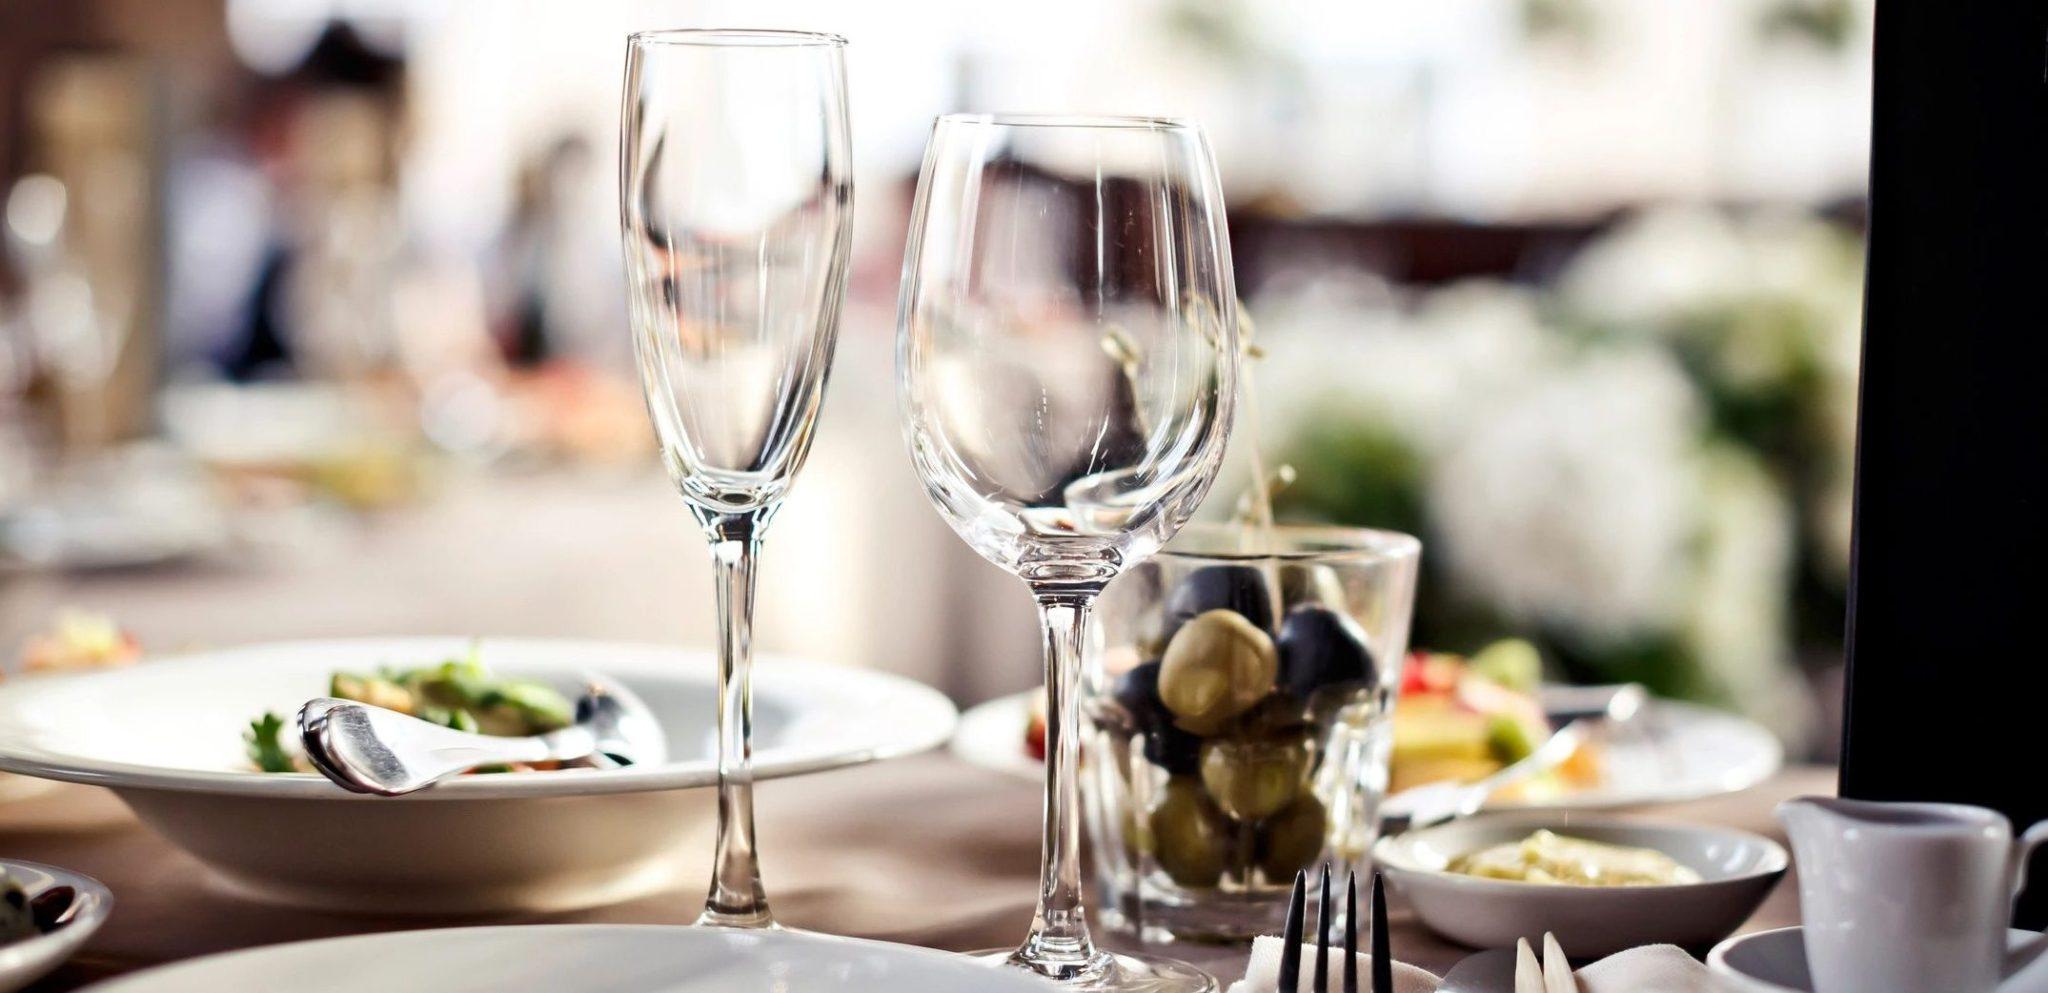 Restaurants & Hospitality